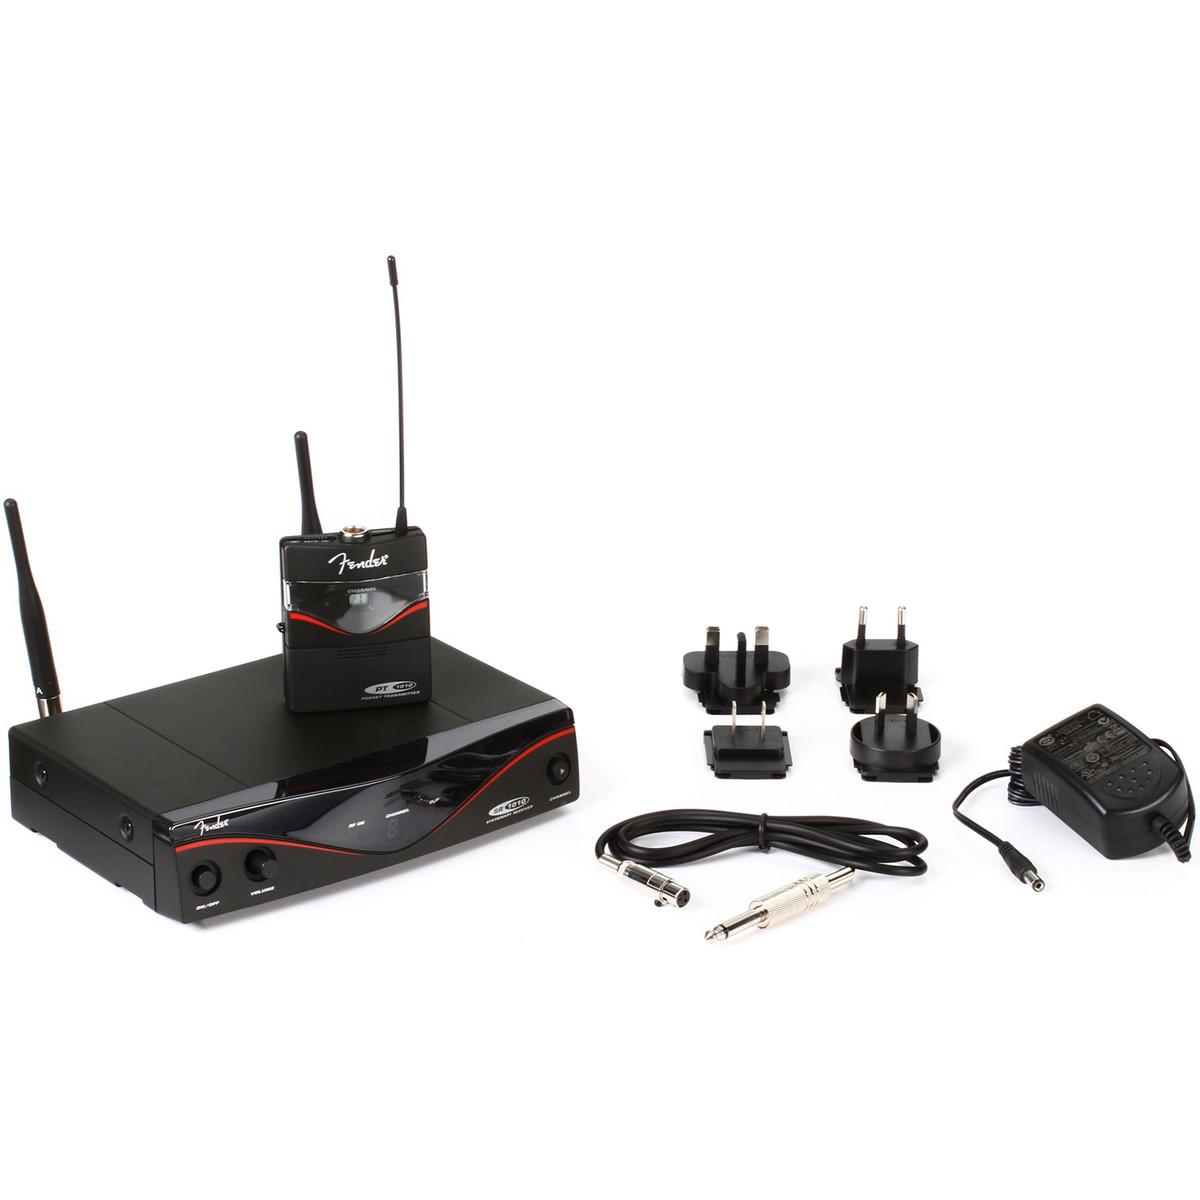 disc fender fwg1010 wireless system band d at gear4music. Black Bedroom Furniture Sets. Home Design Ideas